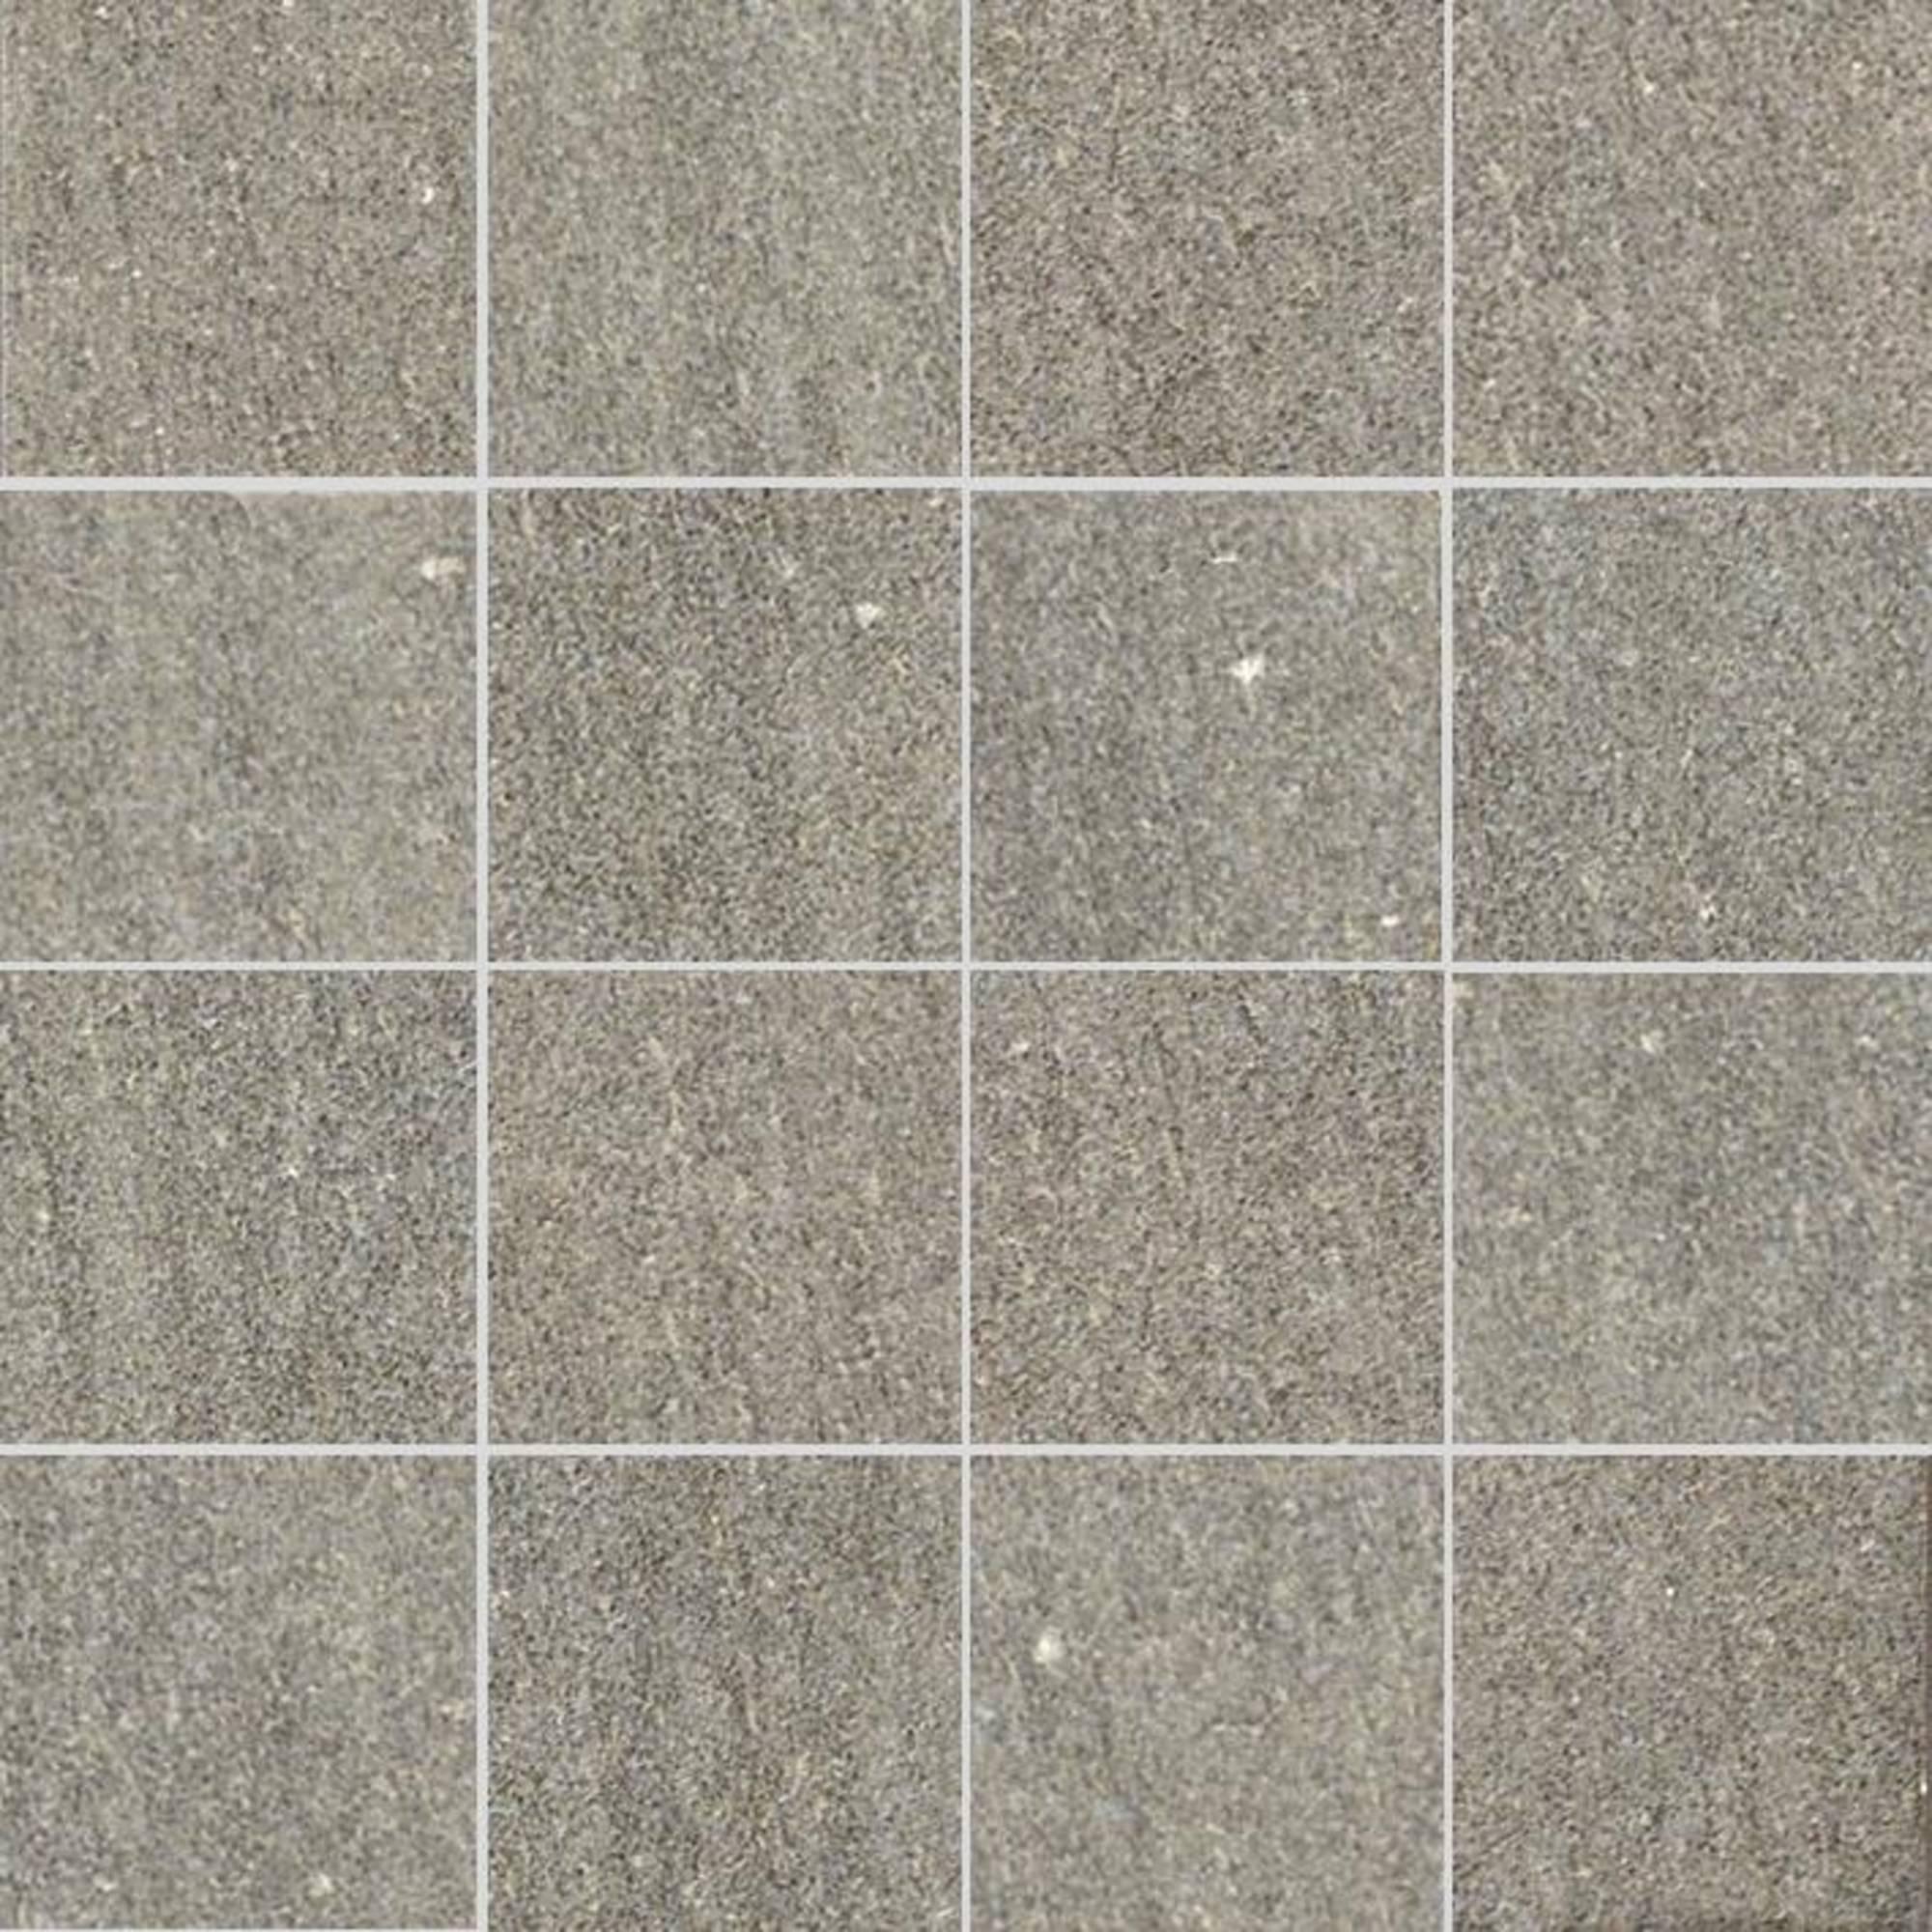 Villeroy & boch Crossover tegelmat 30x30 cm, 7,5x7,5 cm,